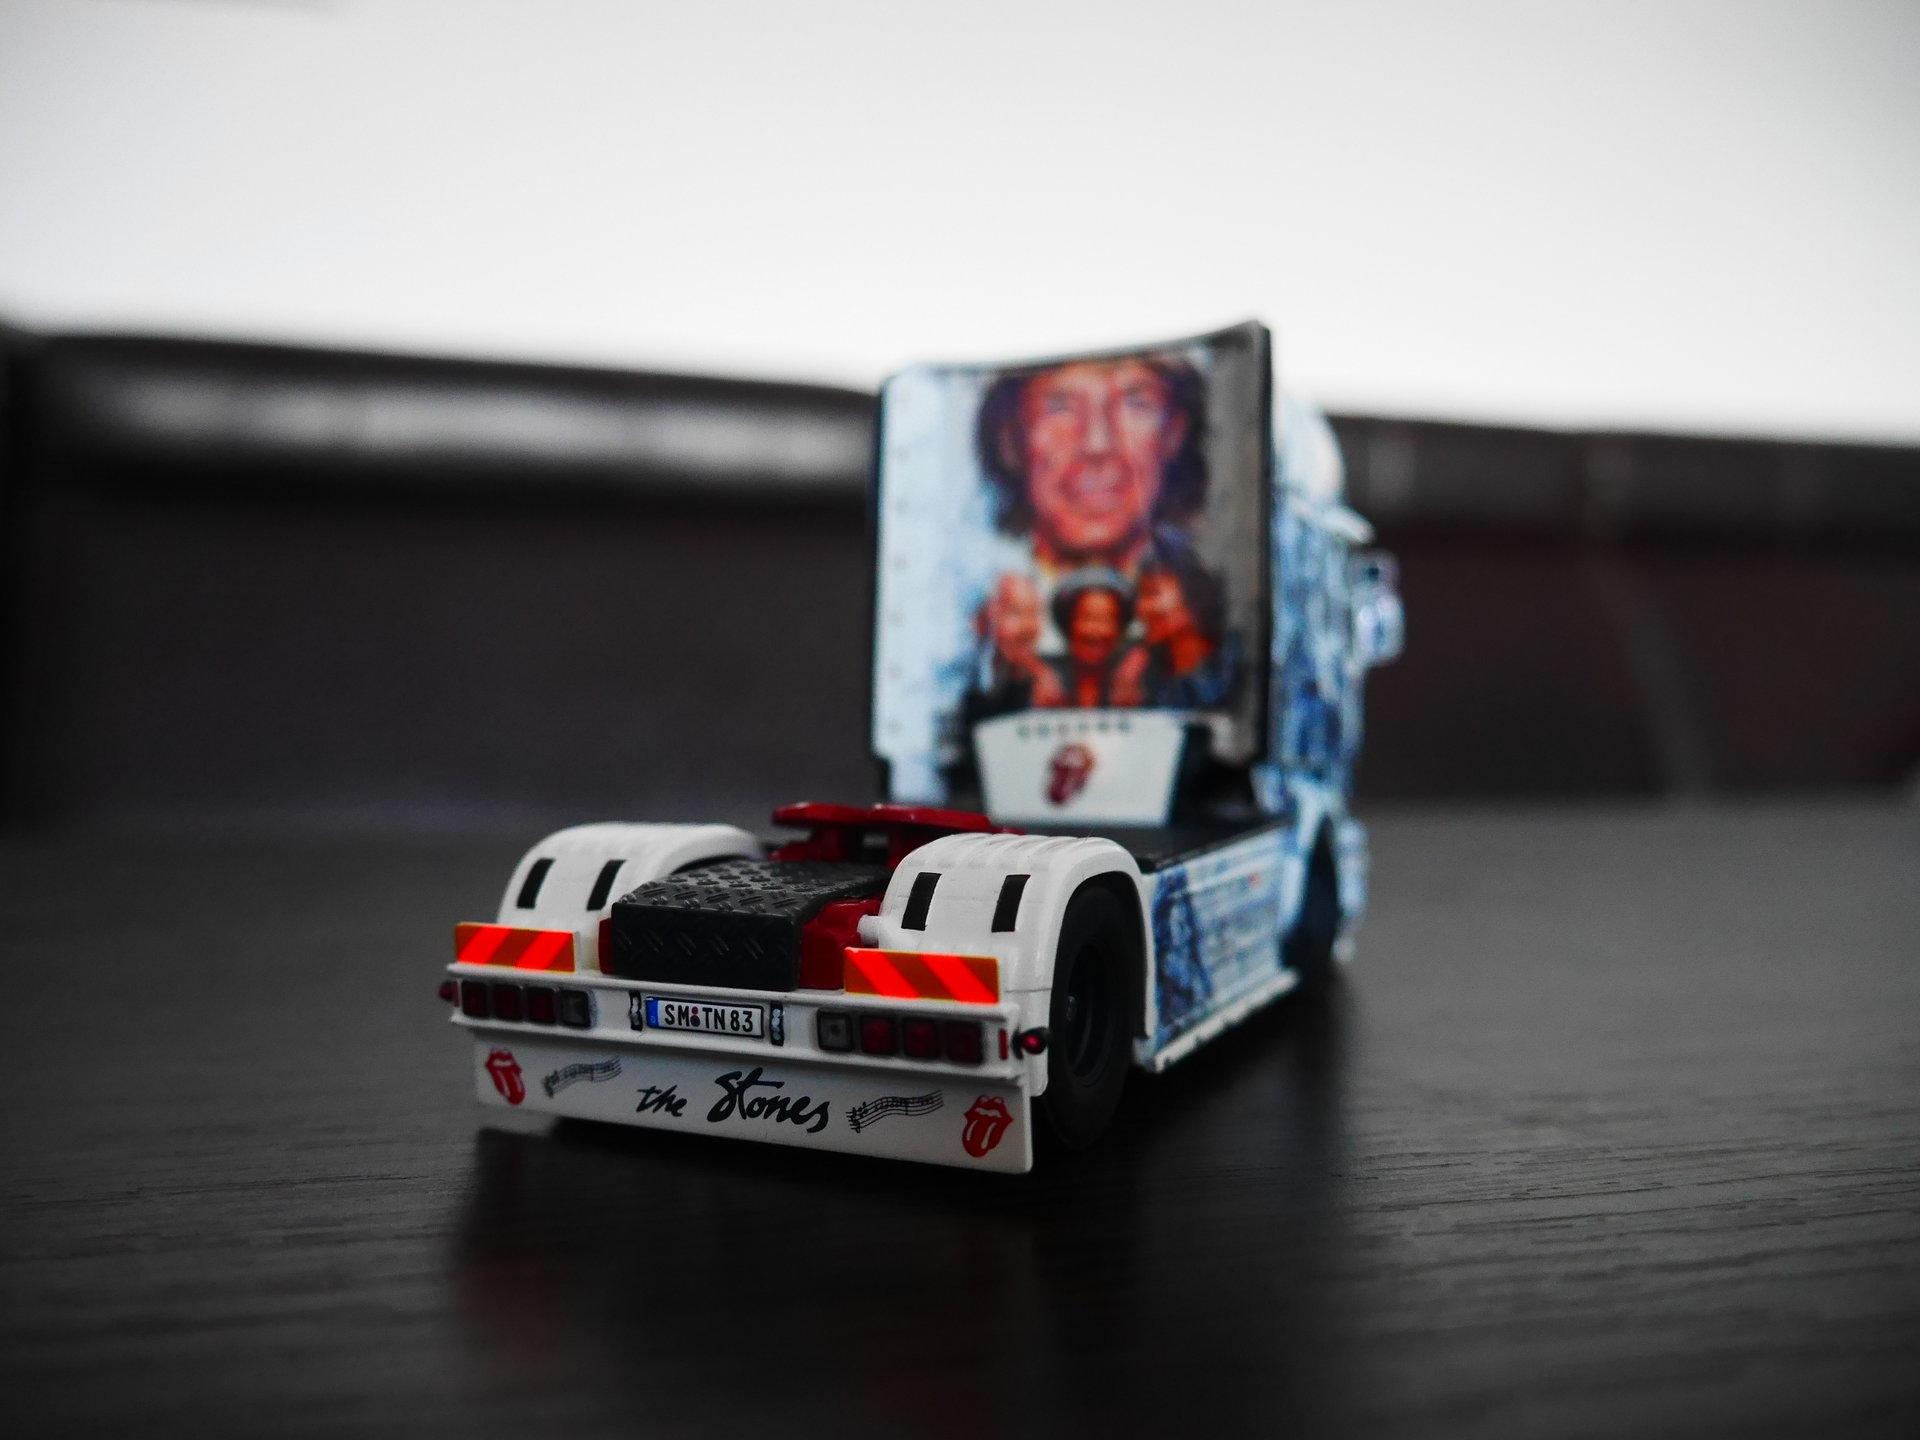 P1060820.JPG